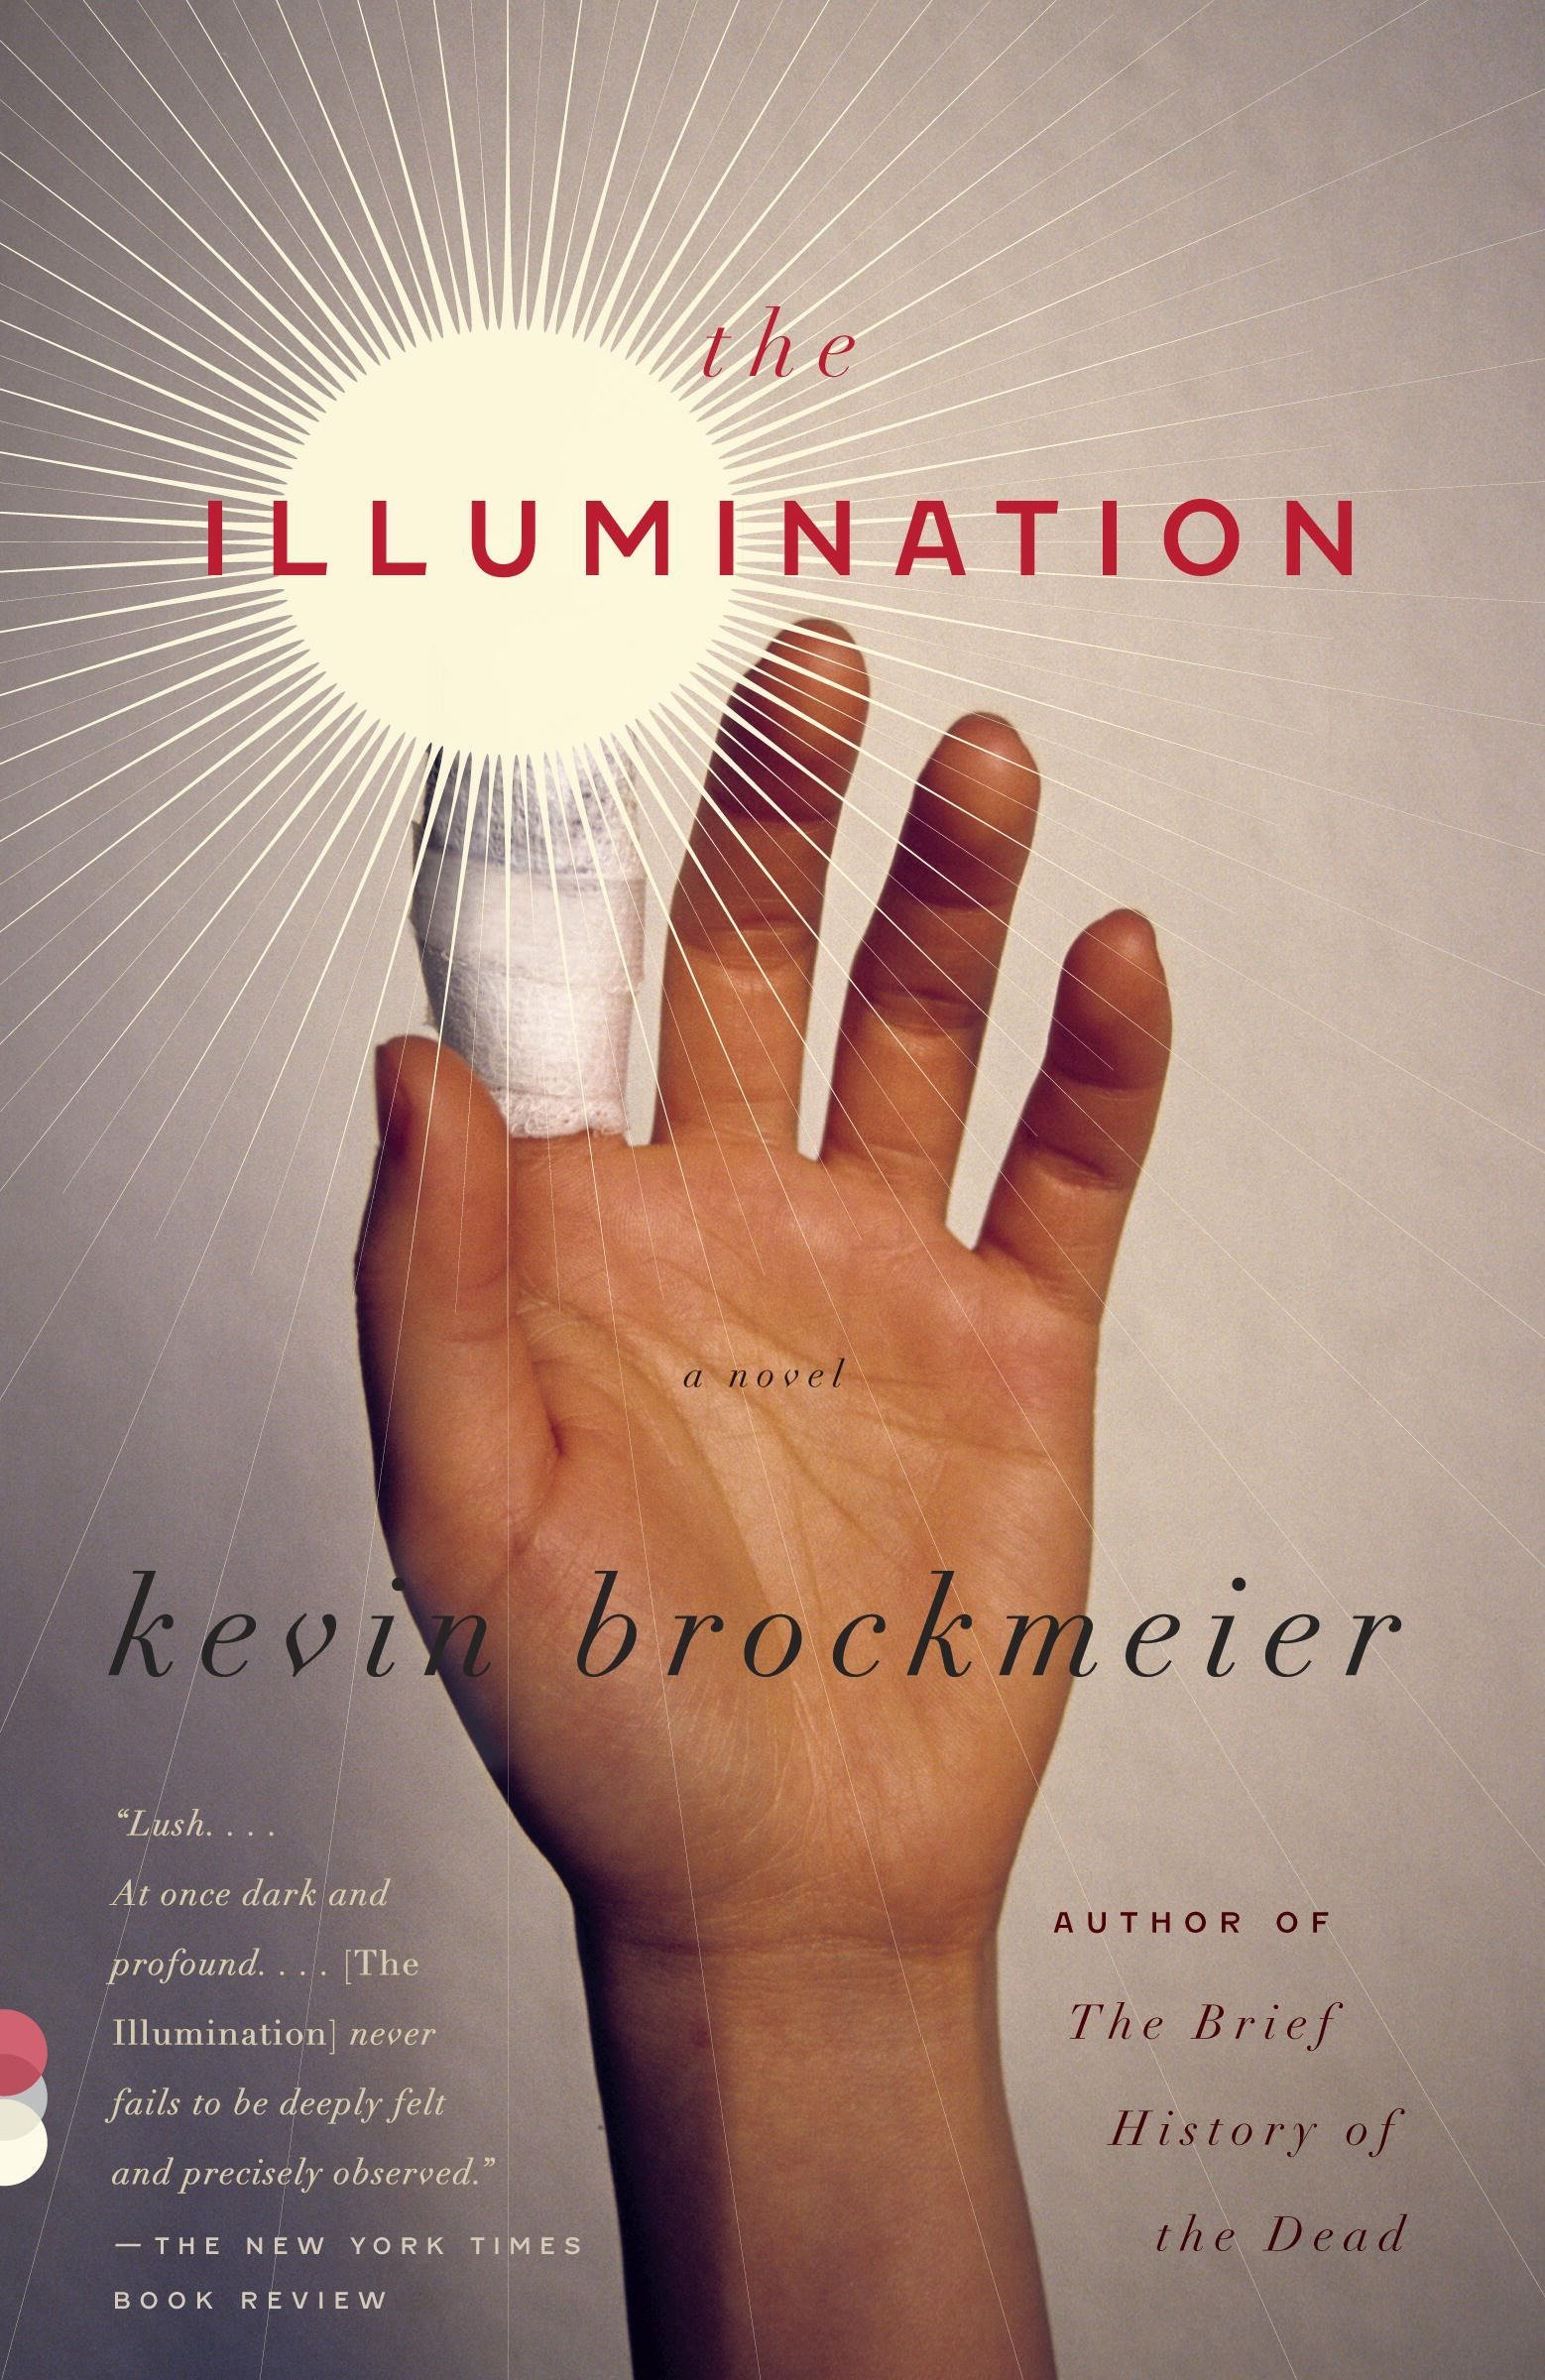 Cover Image of The Illumination